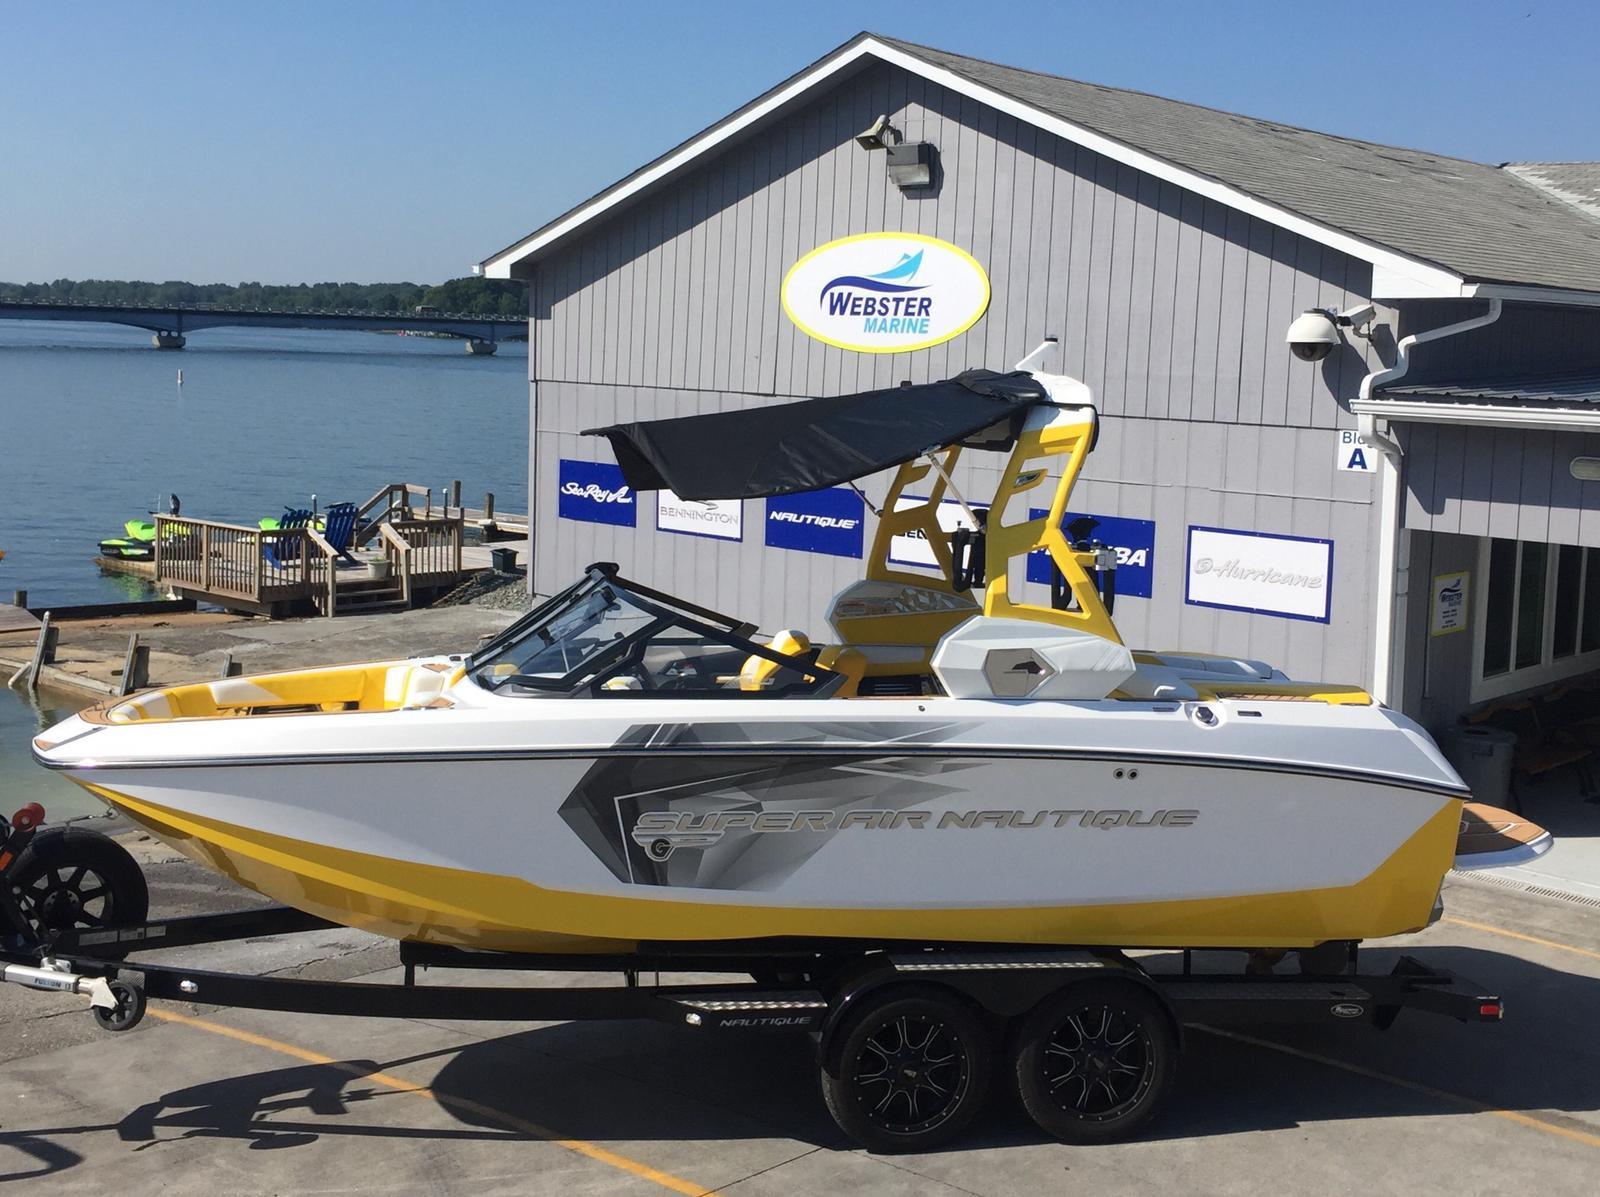 Inventory Webster Marine Center, Inc  Moneta, VA (540) 297-5228